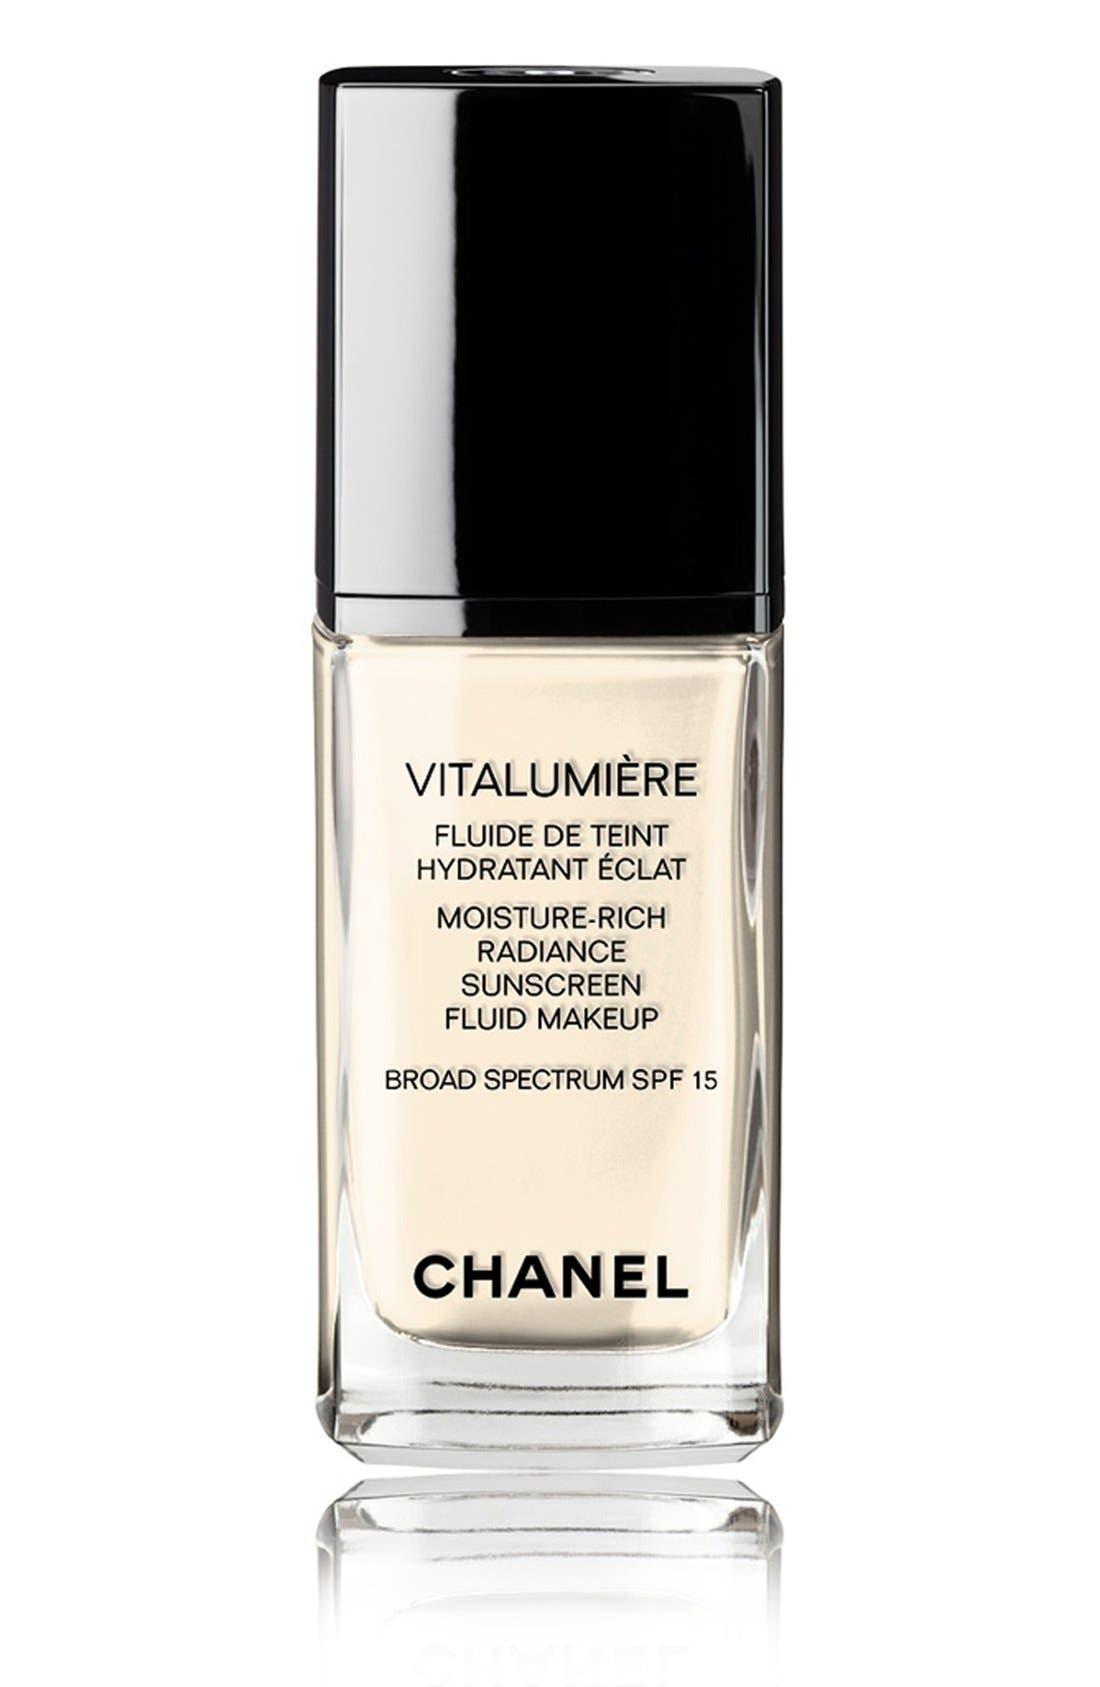 VITALUMIÈRE<br />Moisture-Rich Radiance Sunscreen Fluid Makeup Broad Spectrum SPF 15,                         Main,                         color, 07 IVOIRE